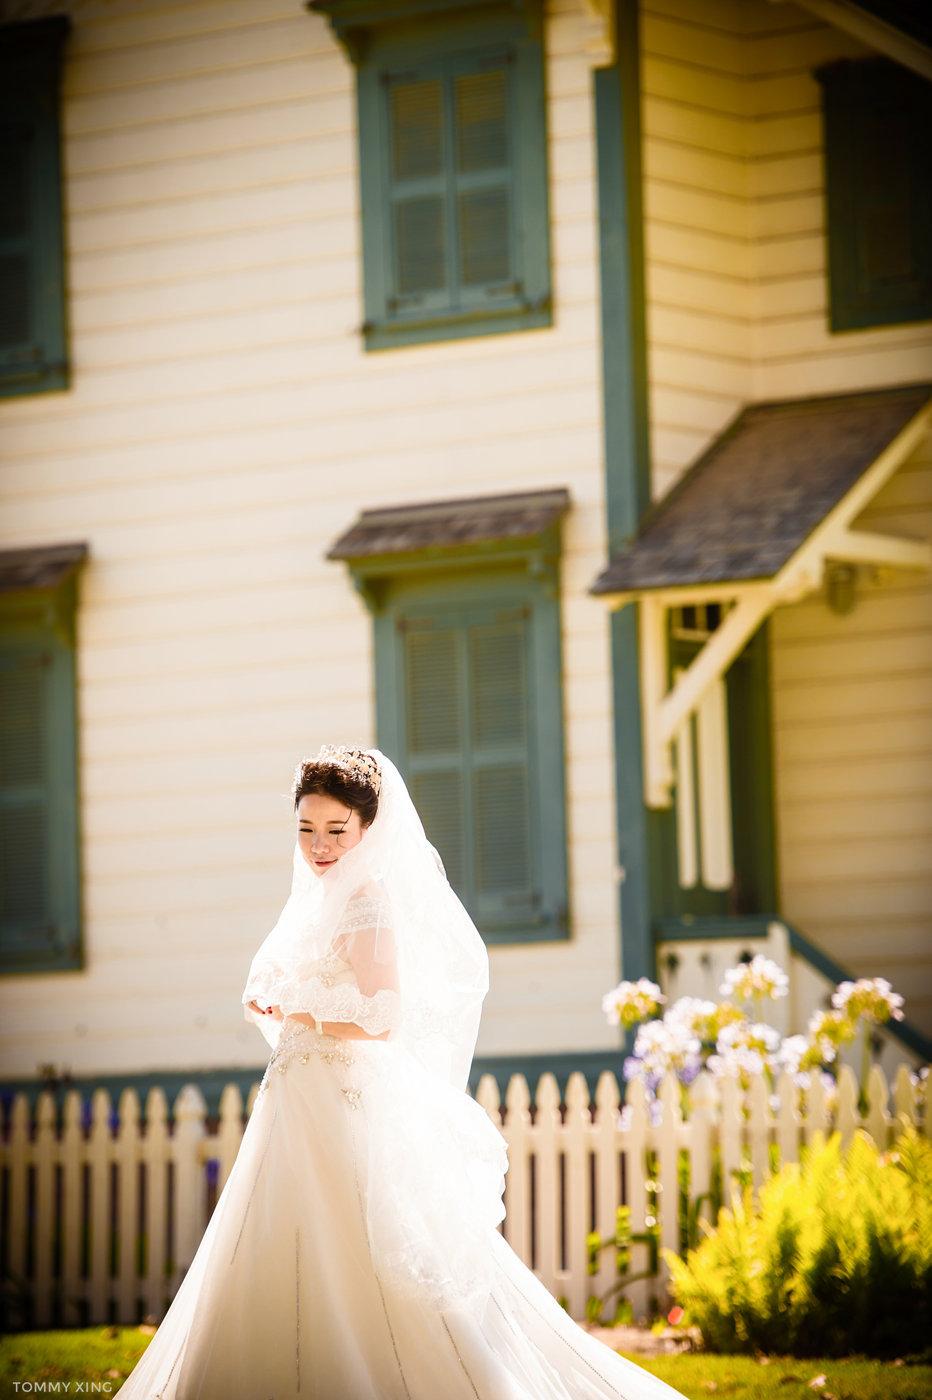 Neighborhood Church Wedding Ranho Palos Verdes Los Angeles Tommy Xing Photography 洛杉矶旧金山婚礼婚纱照摄影师 129.jpg